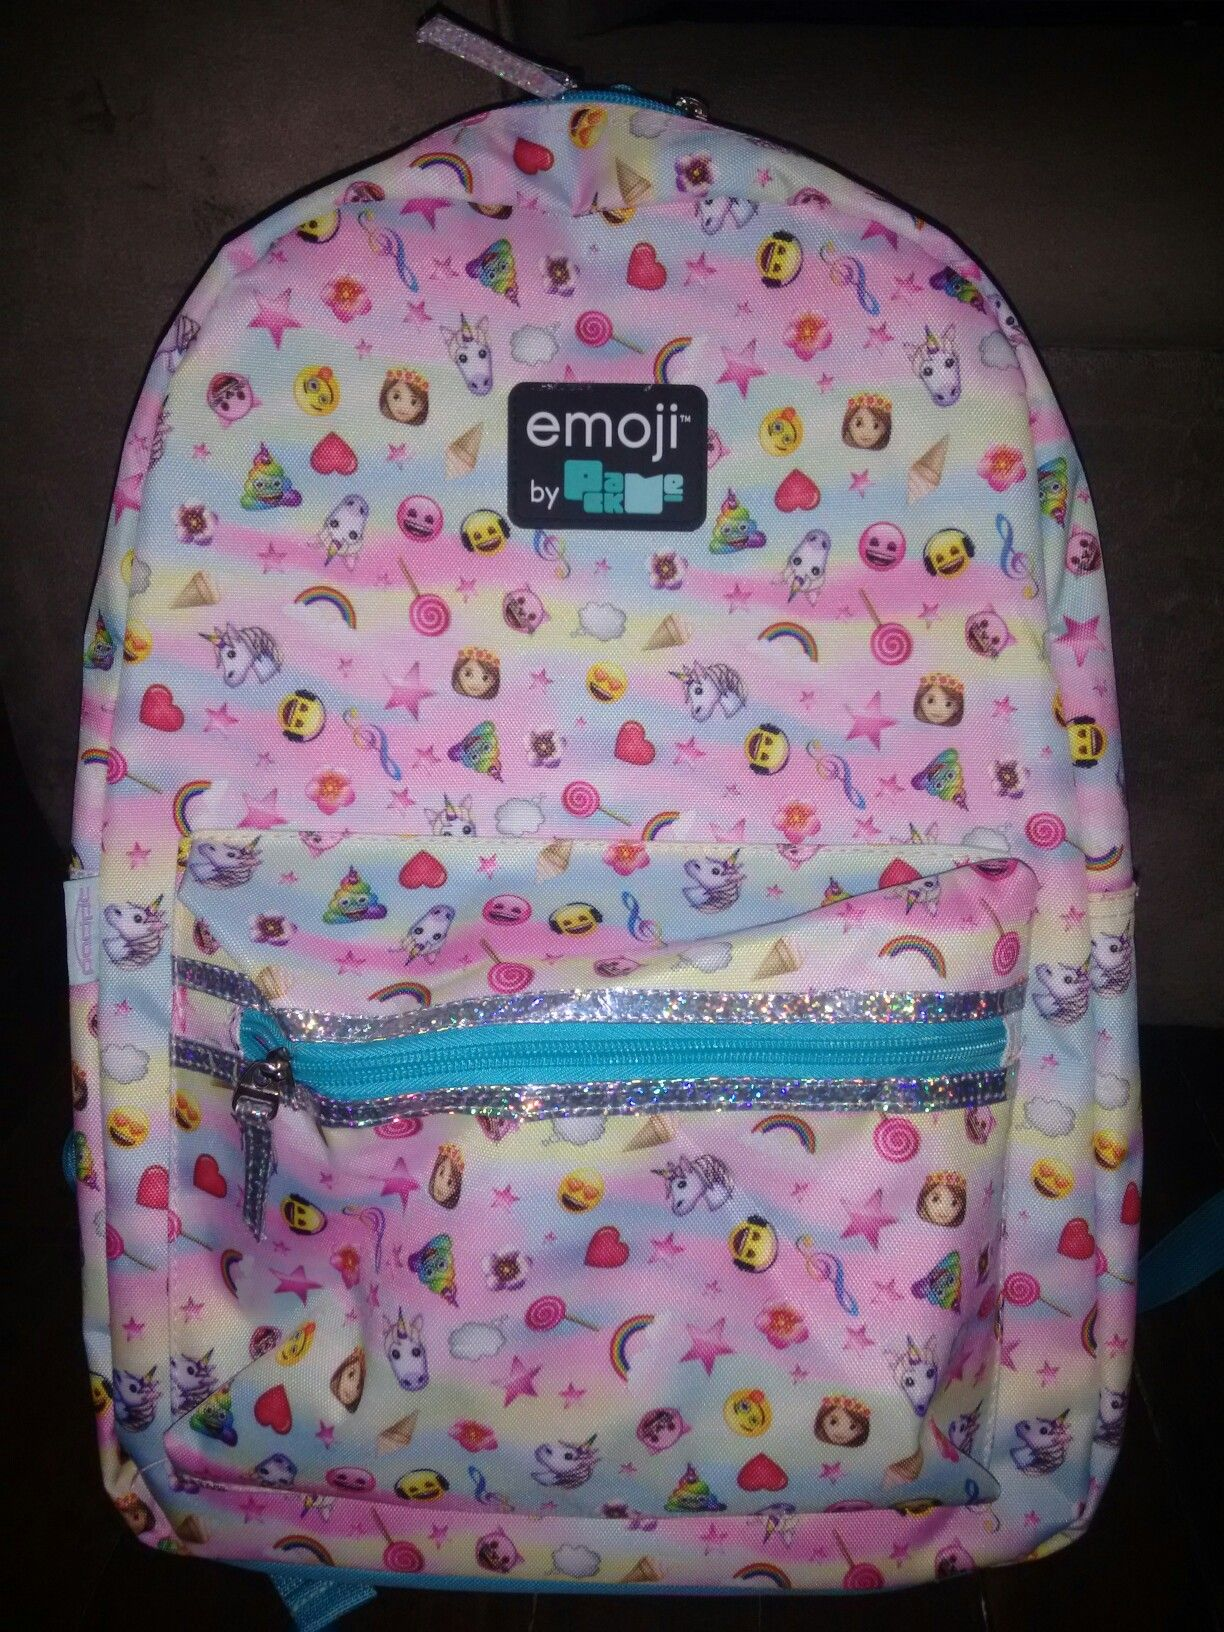 Feminina Unicornio mochila Emoji Mochila voltaasaulas De rRXU7xnRHW